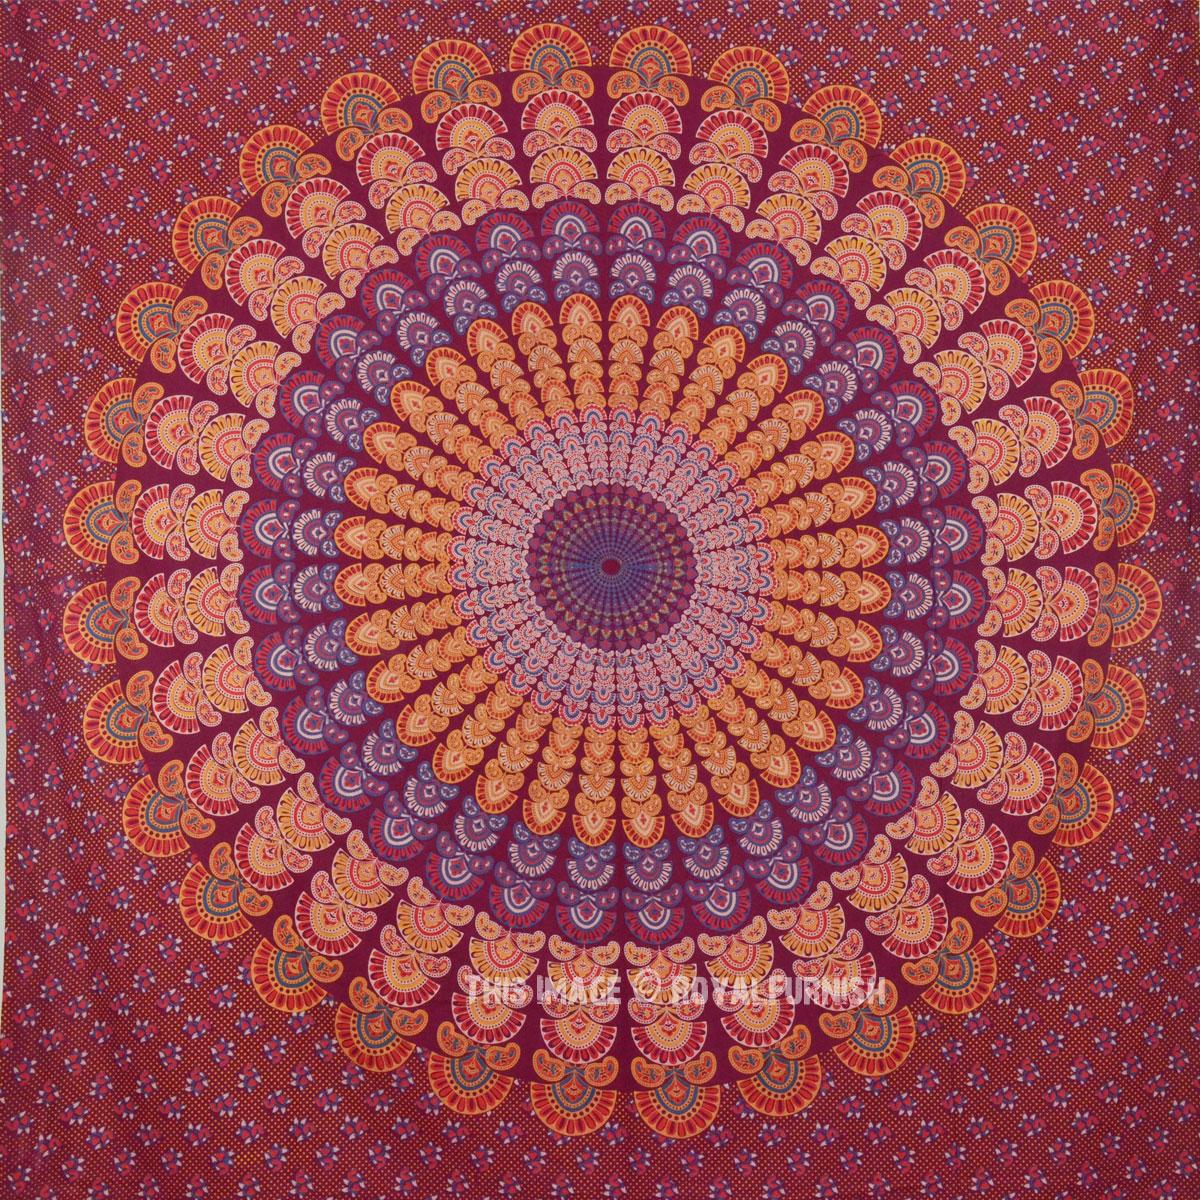 Colorful Large Red Multi Peacock Mandala Tapestry, Boho Bedding - RoyalFurnish.com